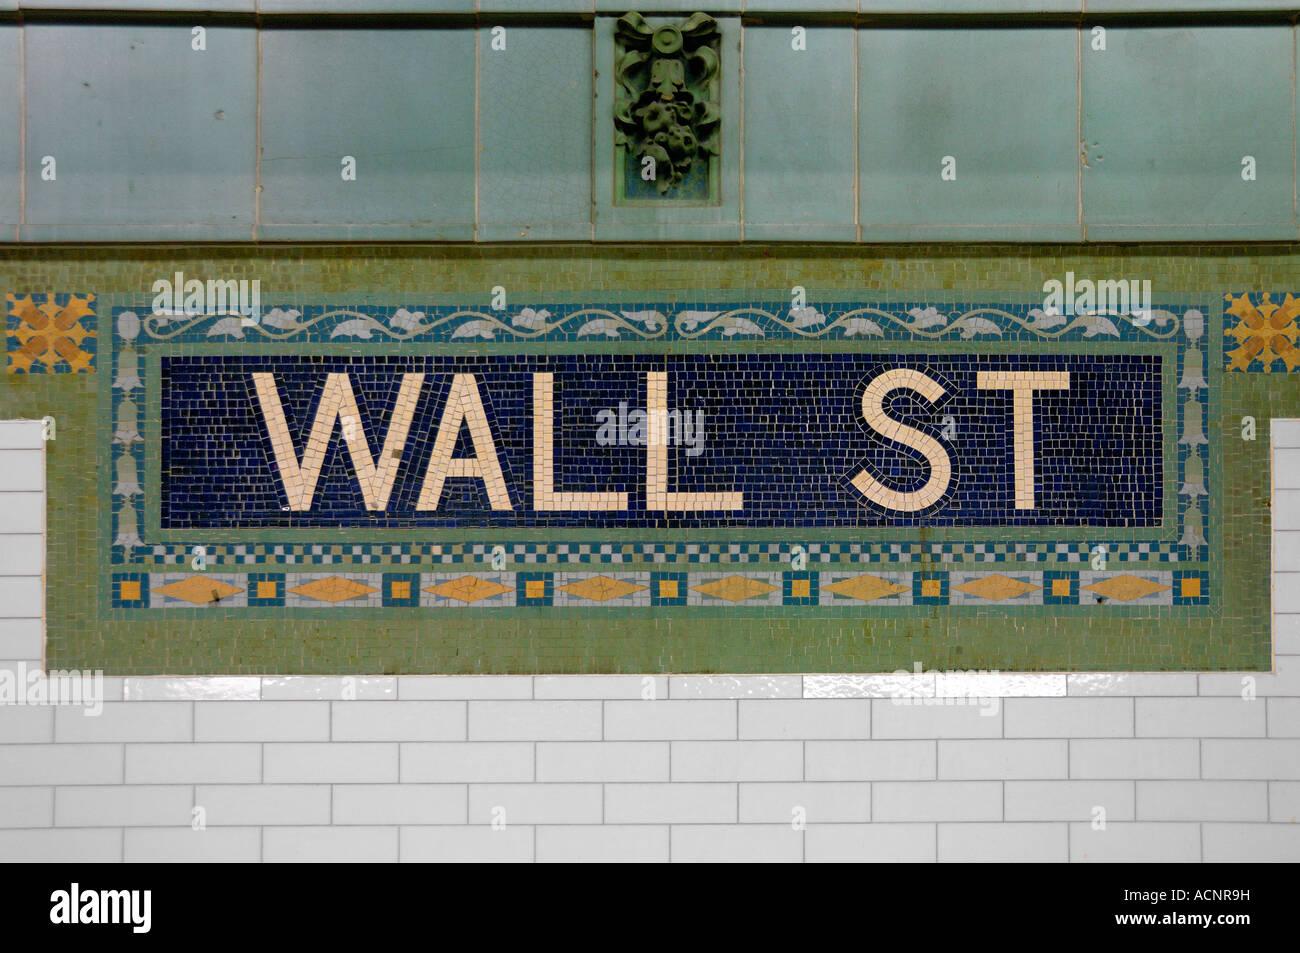 Wall street Subway station mosaic New York USA - Stock Image